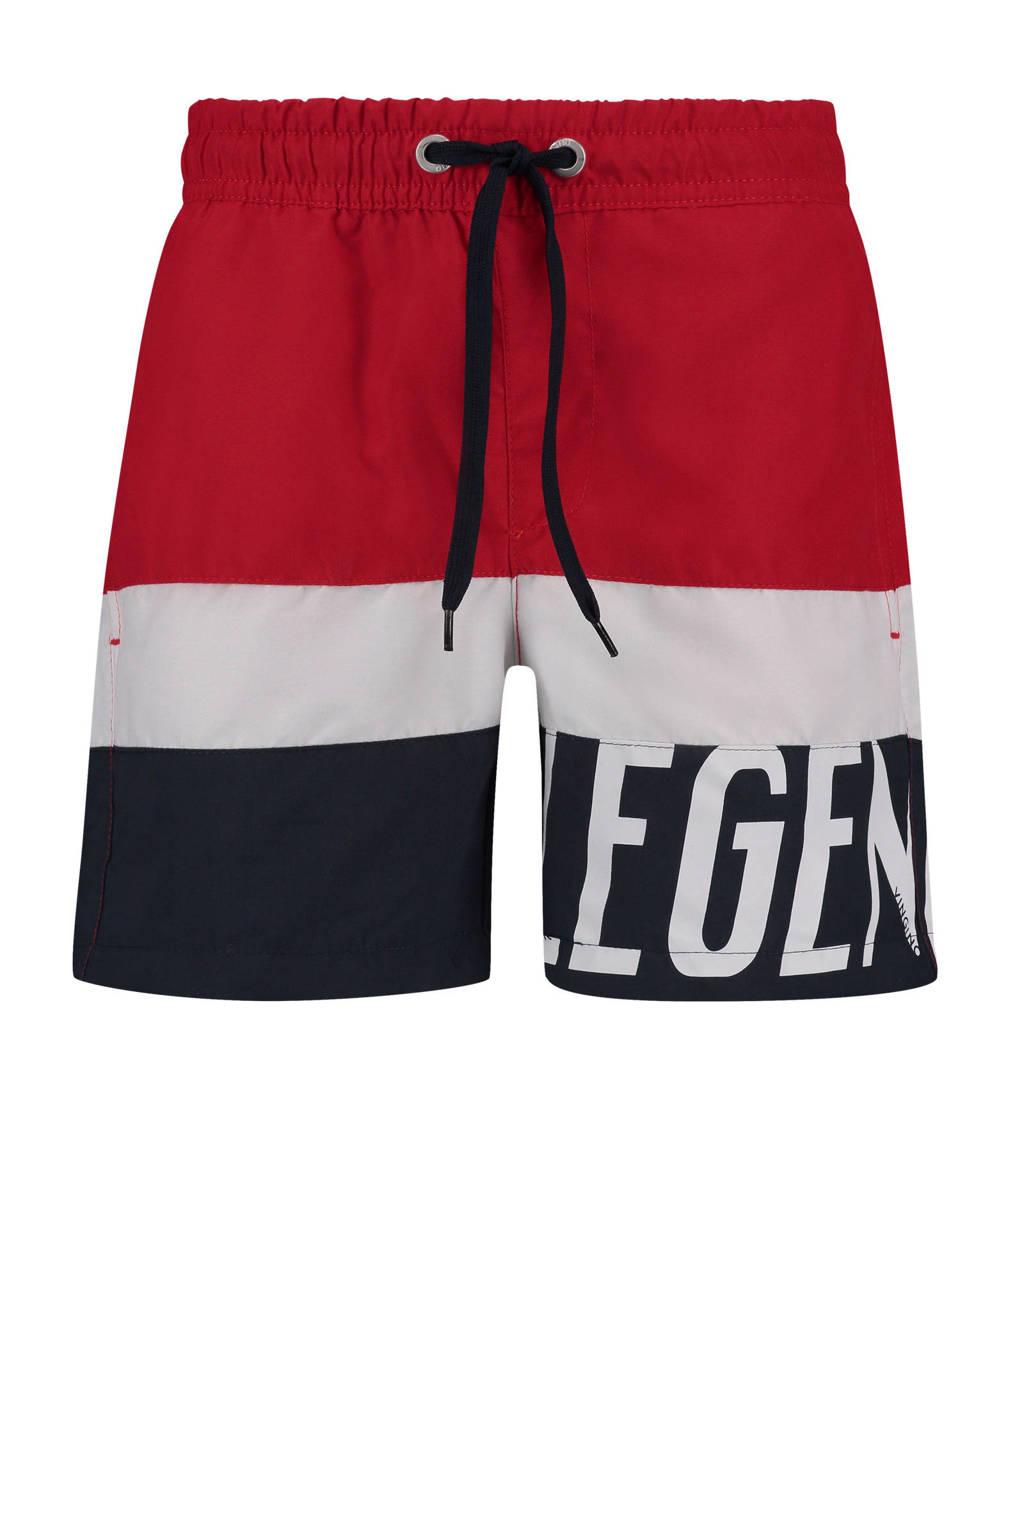 Vingino zwemshort rood/wit/blauw, Rood/wit/blauw